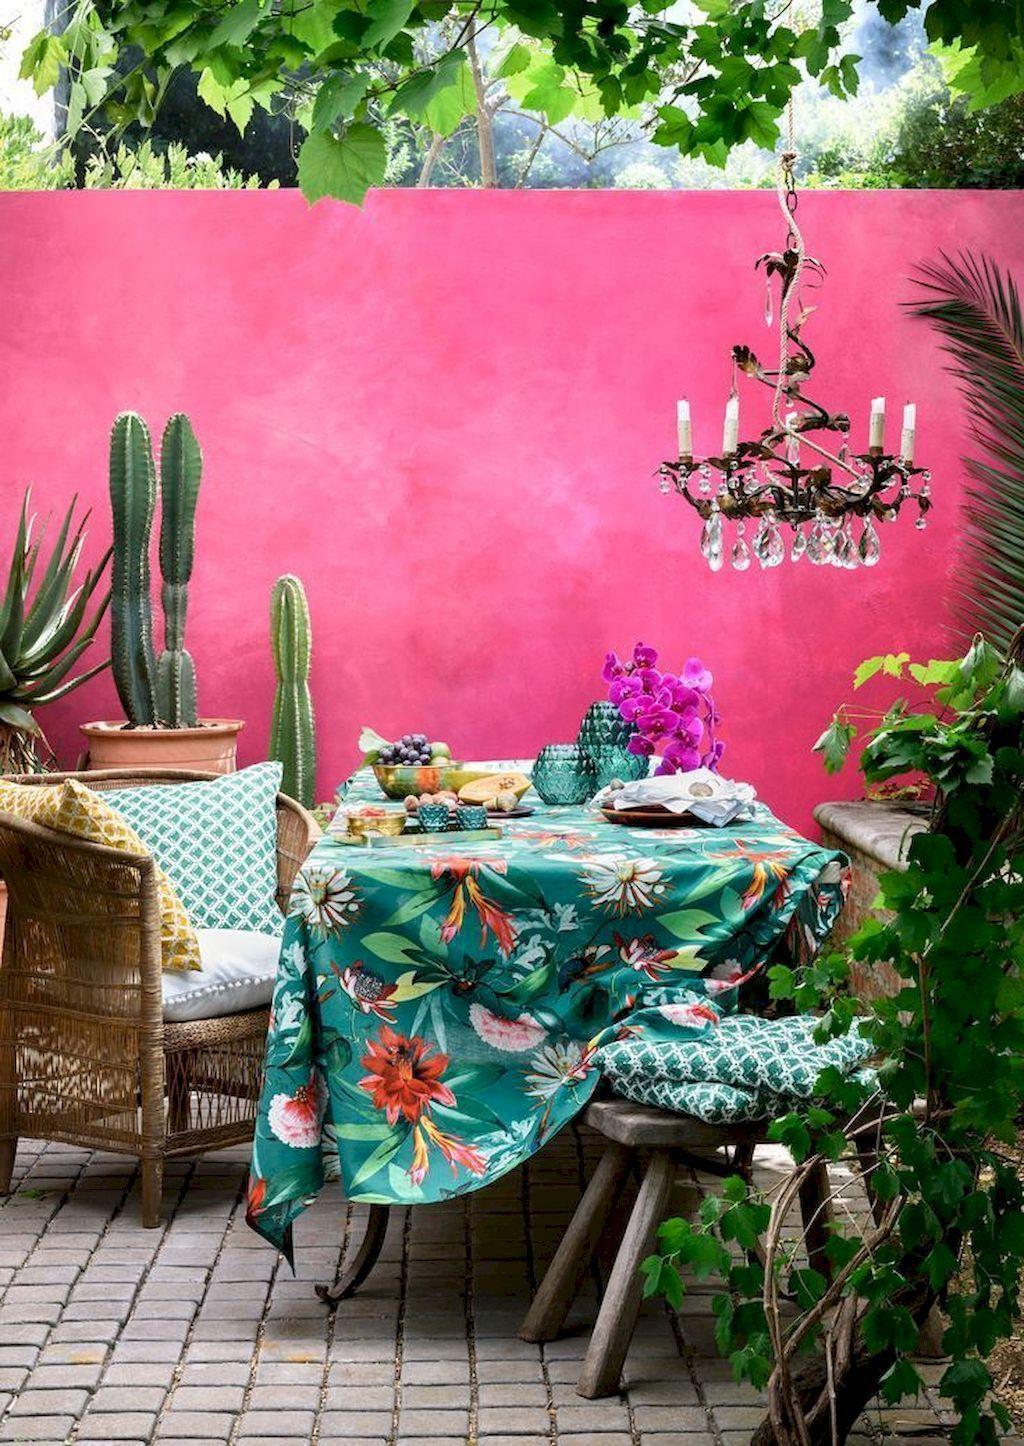 Cool 115 Romantic Tropical Wedding Ideas Reception Centerpiece Https Bellestilo Com 3963 115 Romantic Tropical Tropical Home Decor Tropical Decor Patio Decor